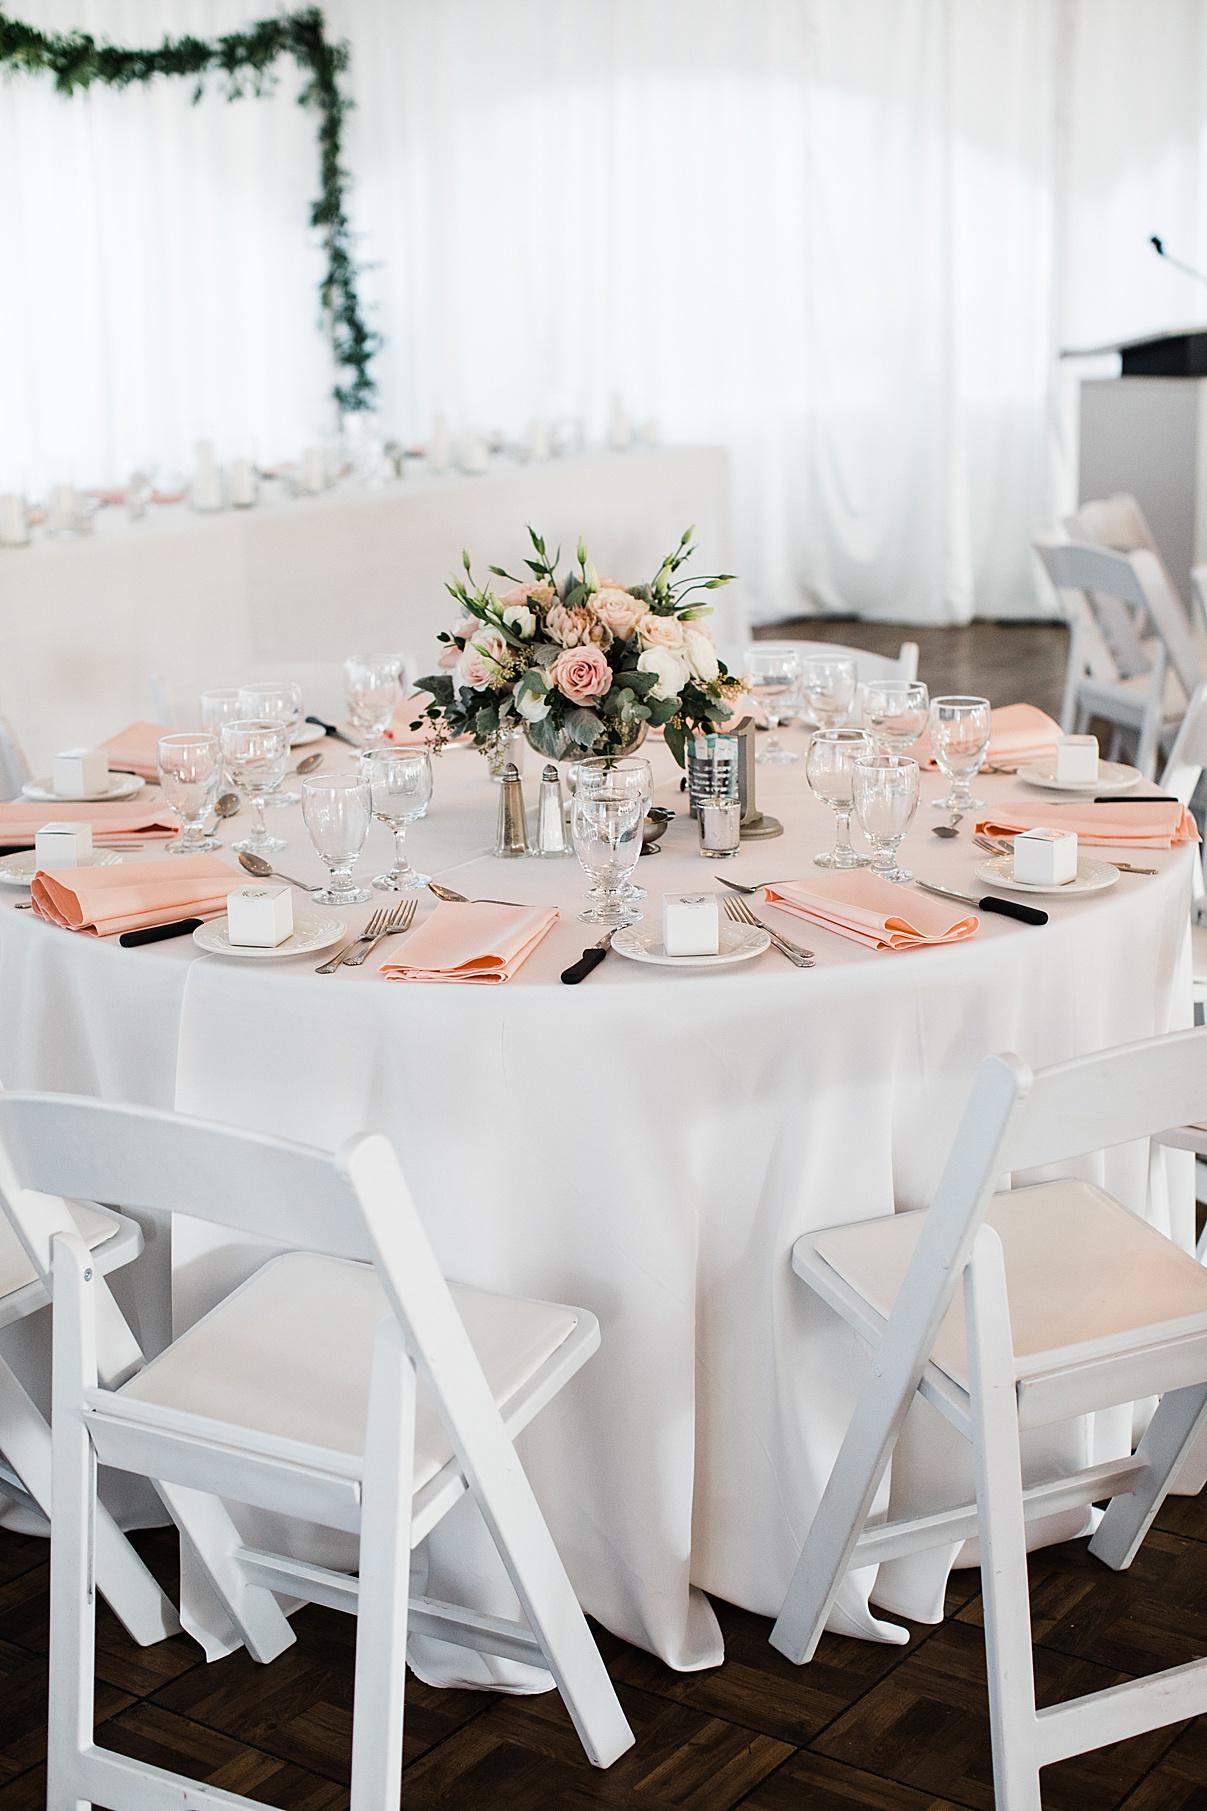 Romantic wedding reception table setting| Harding Waterfront Estate Wedding| Ontario wedding photographer| Toronto wedding photographer| 3 Photography | 3photography.ca